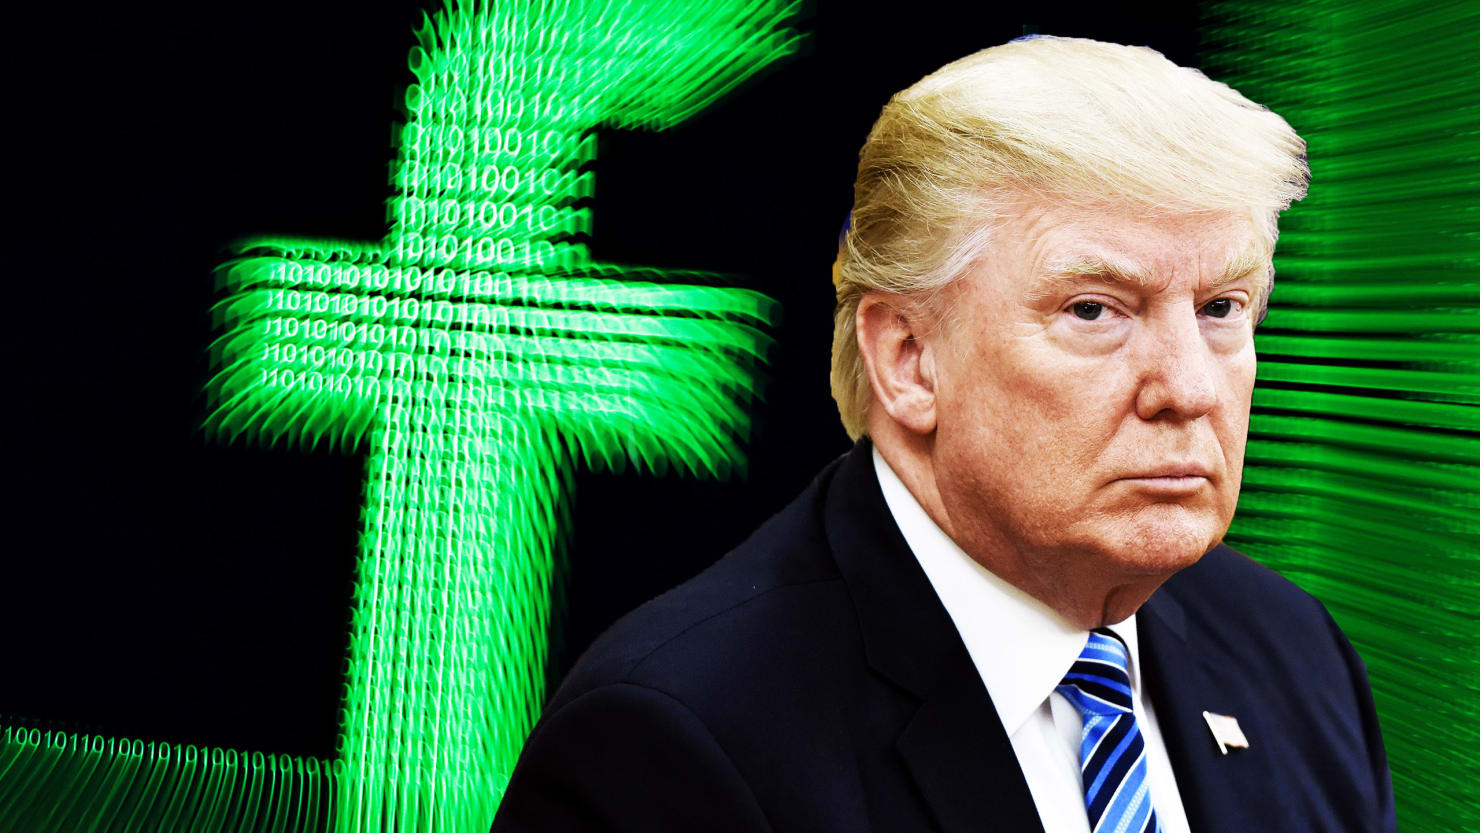 Cambridge Analytica's Real Role in Trump's Dark Facebook Campaign